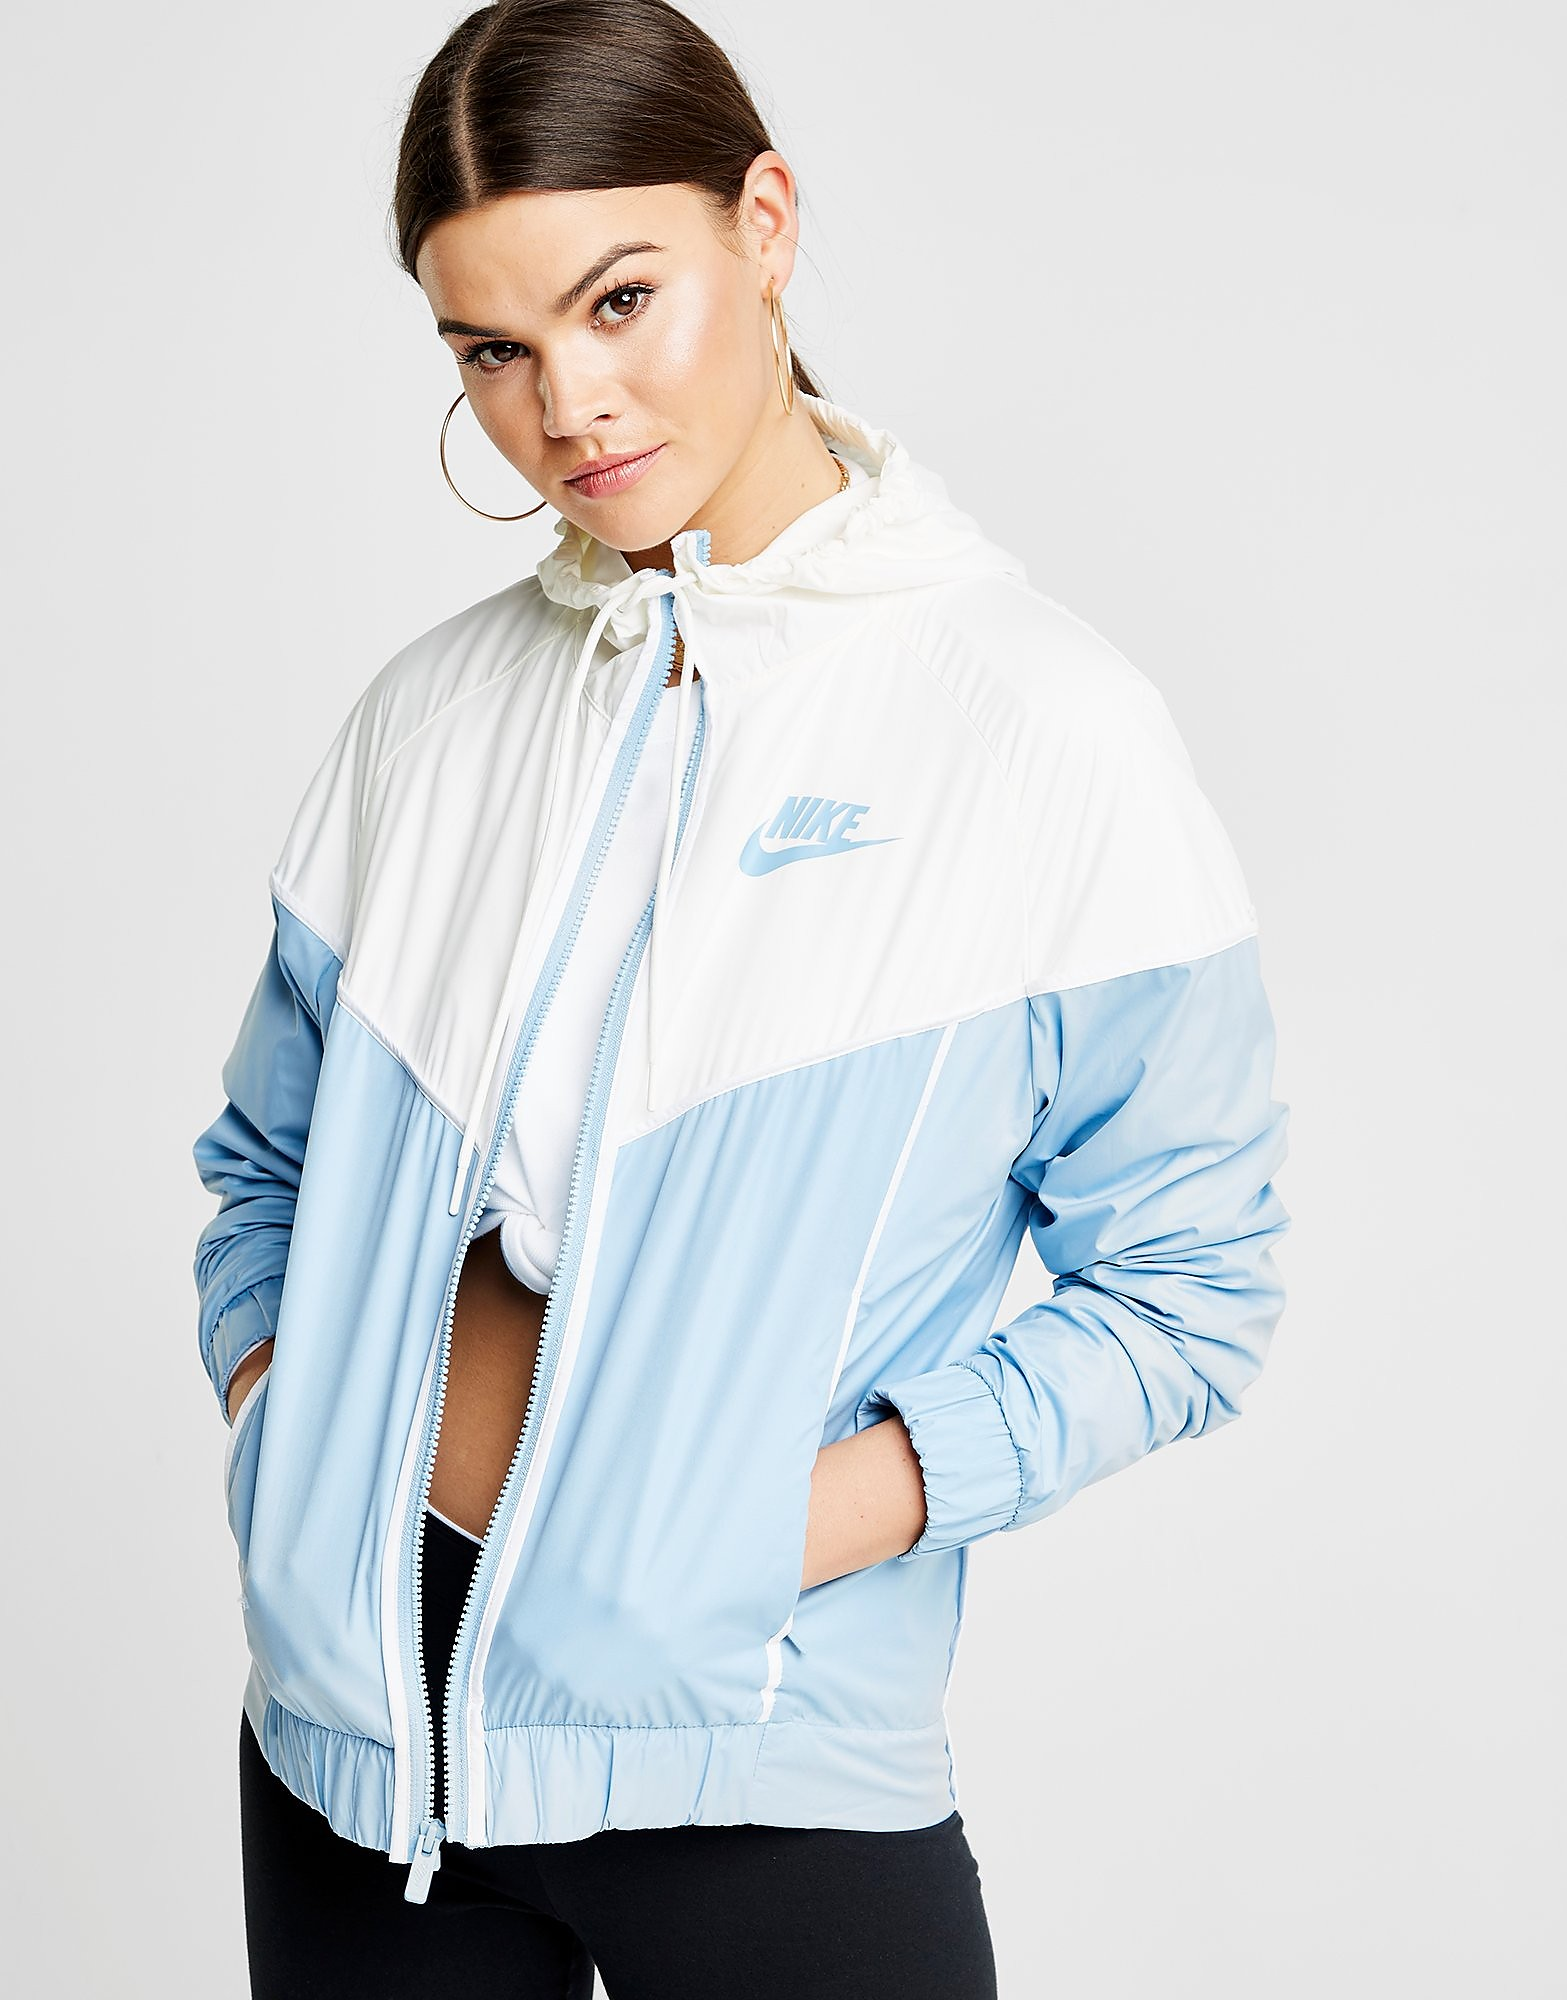 Nike Colourblock Windrunner Jacket